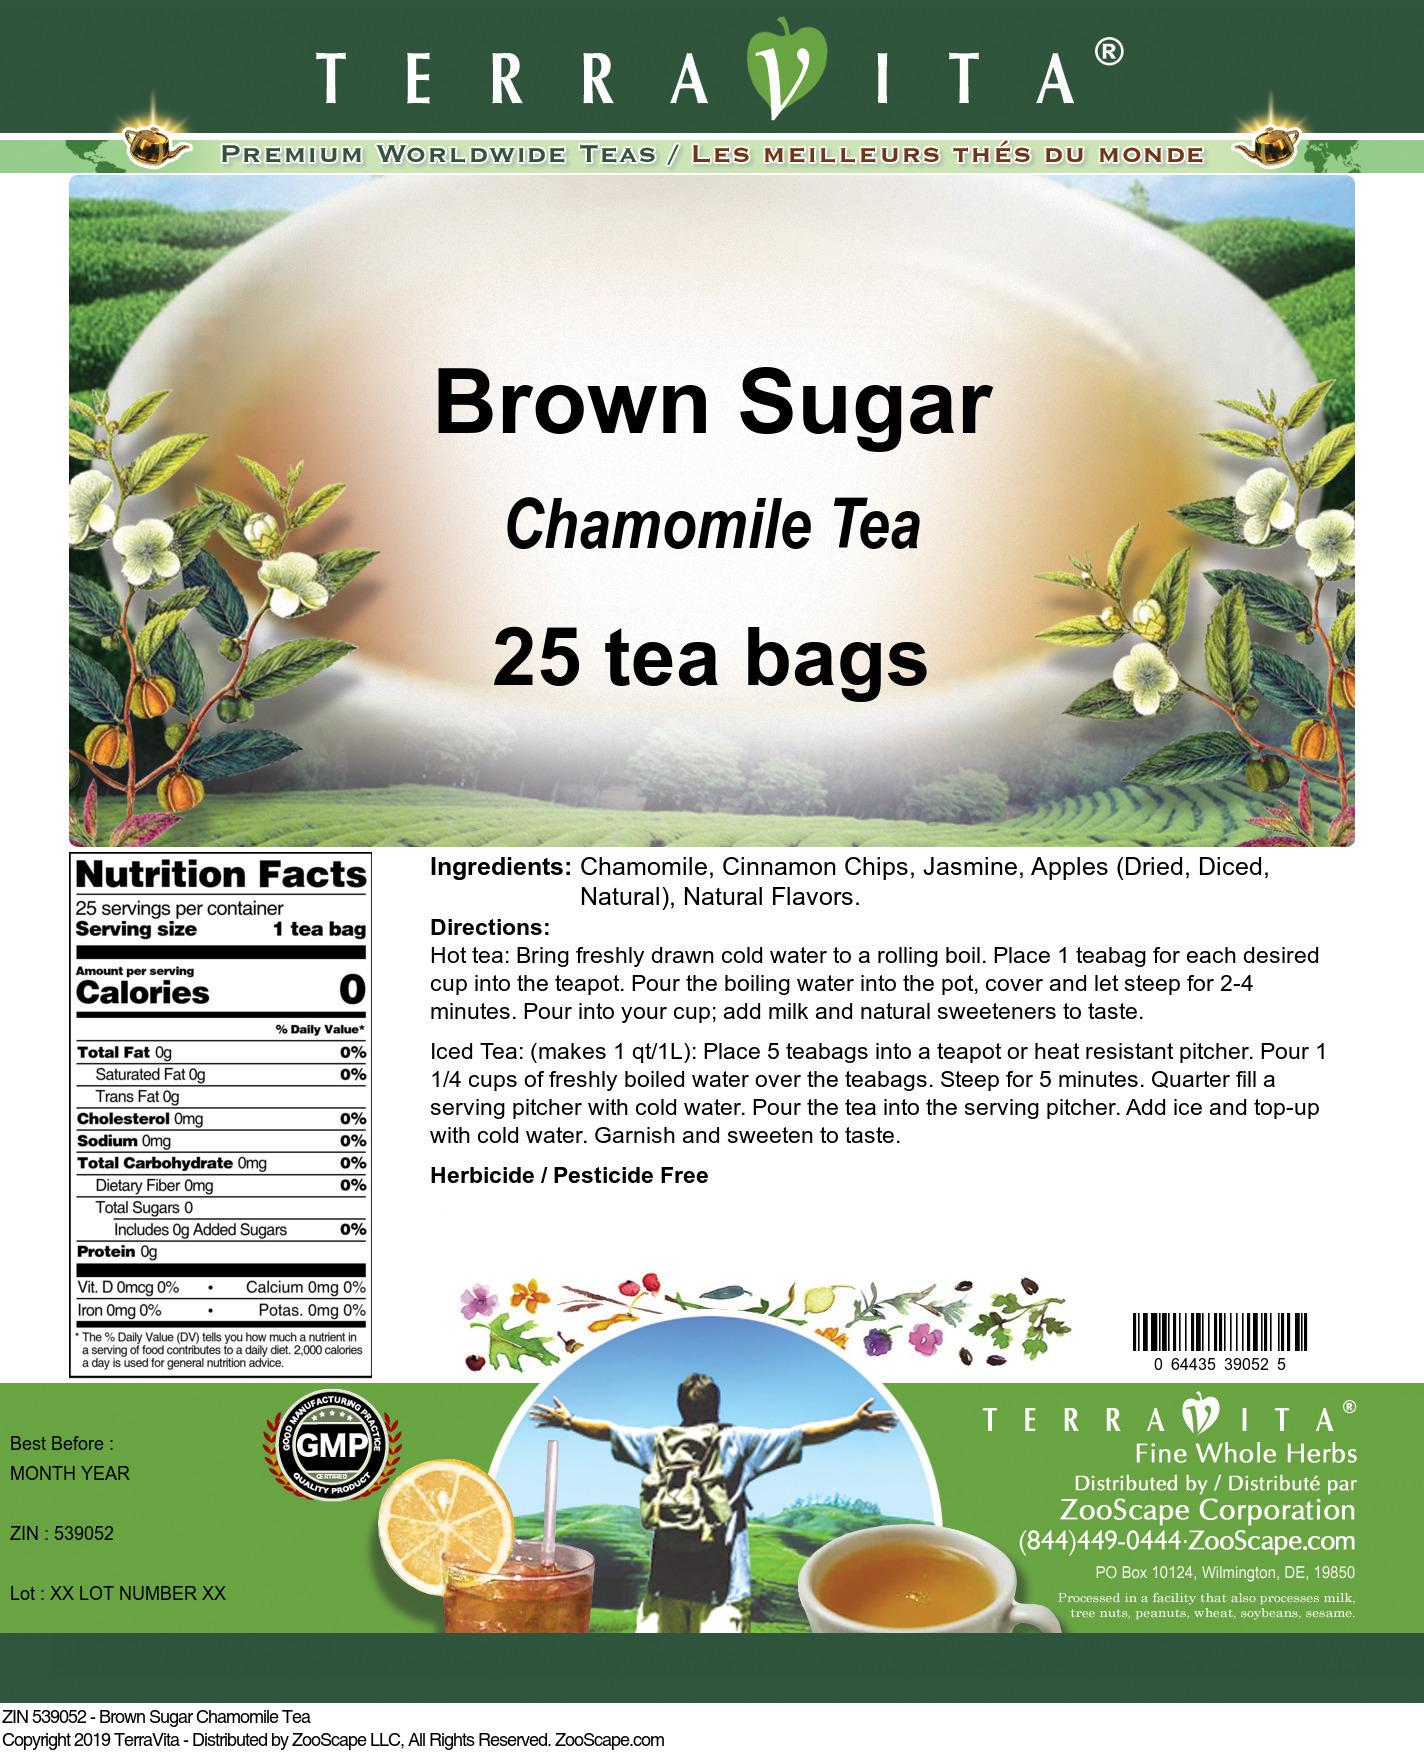 Brown Sugar Chamomile Tea